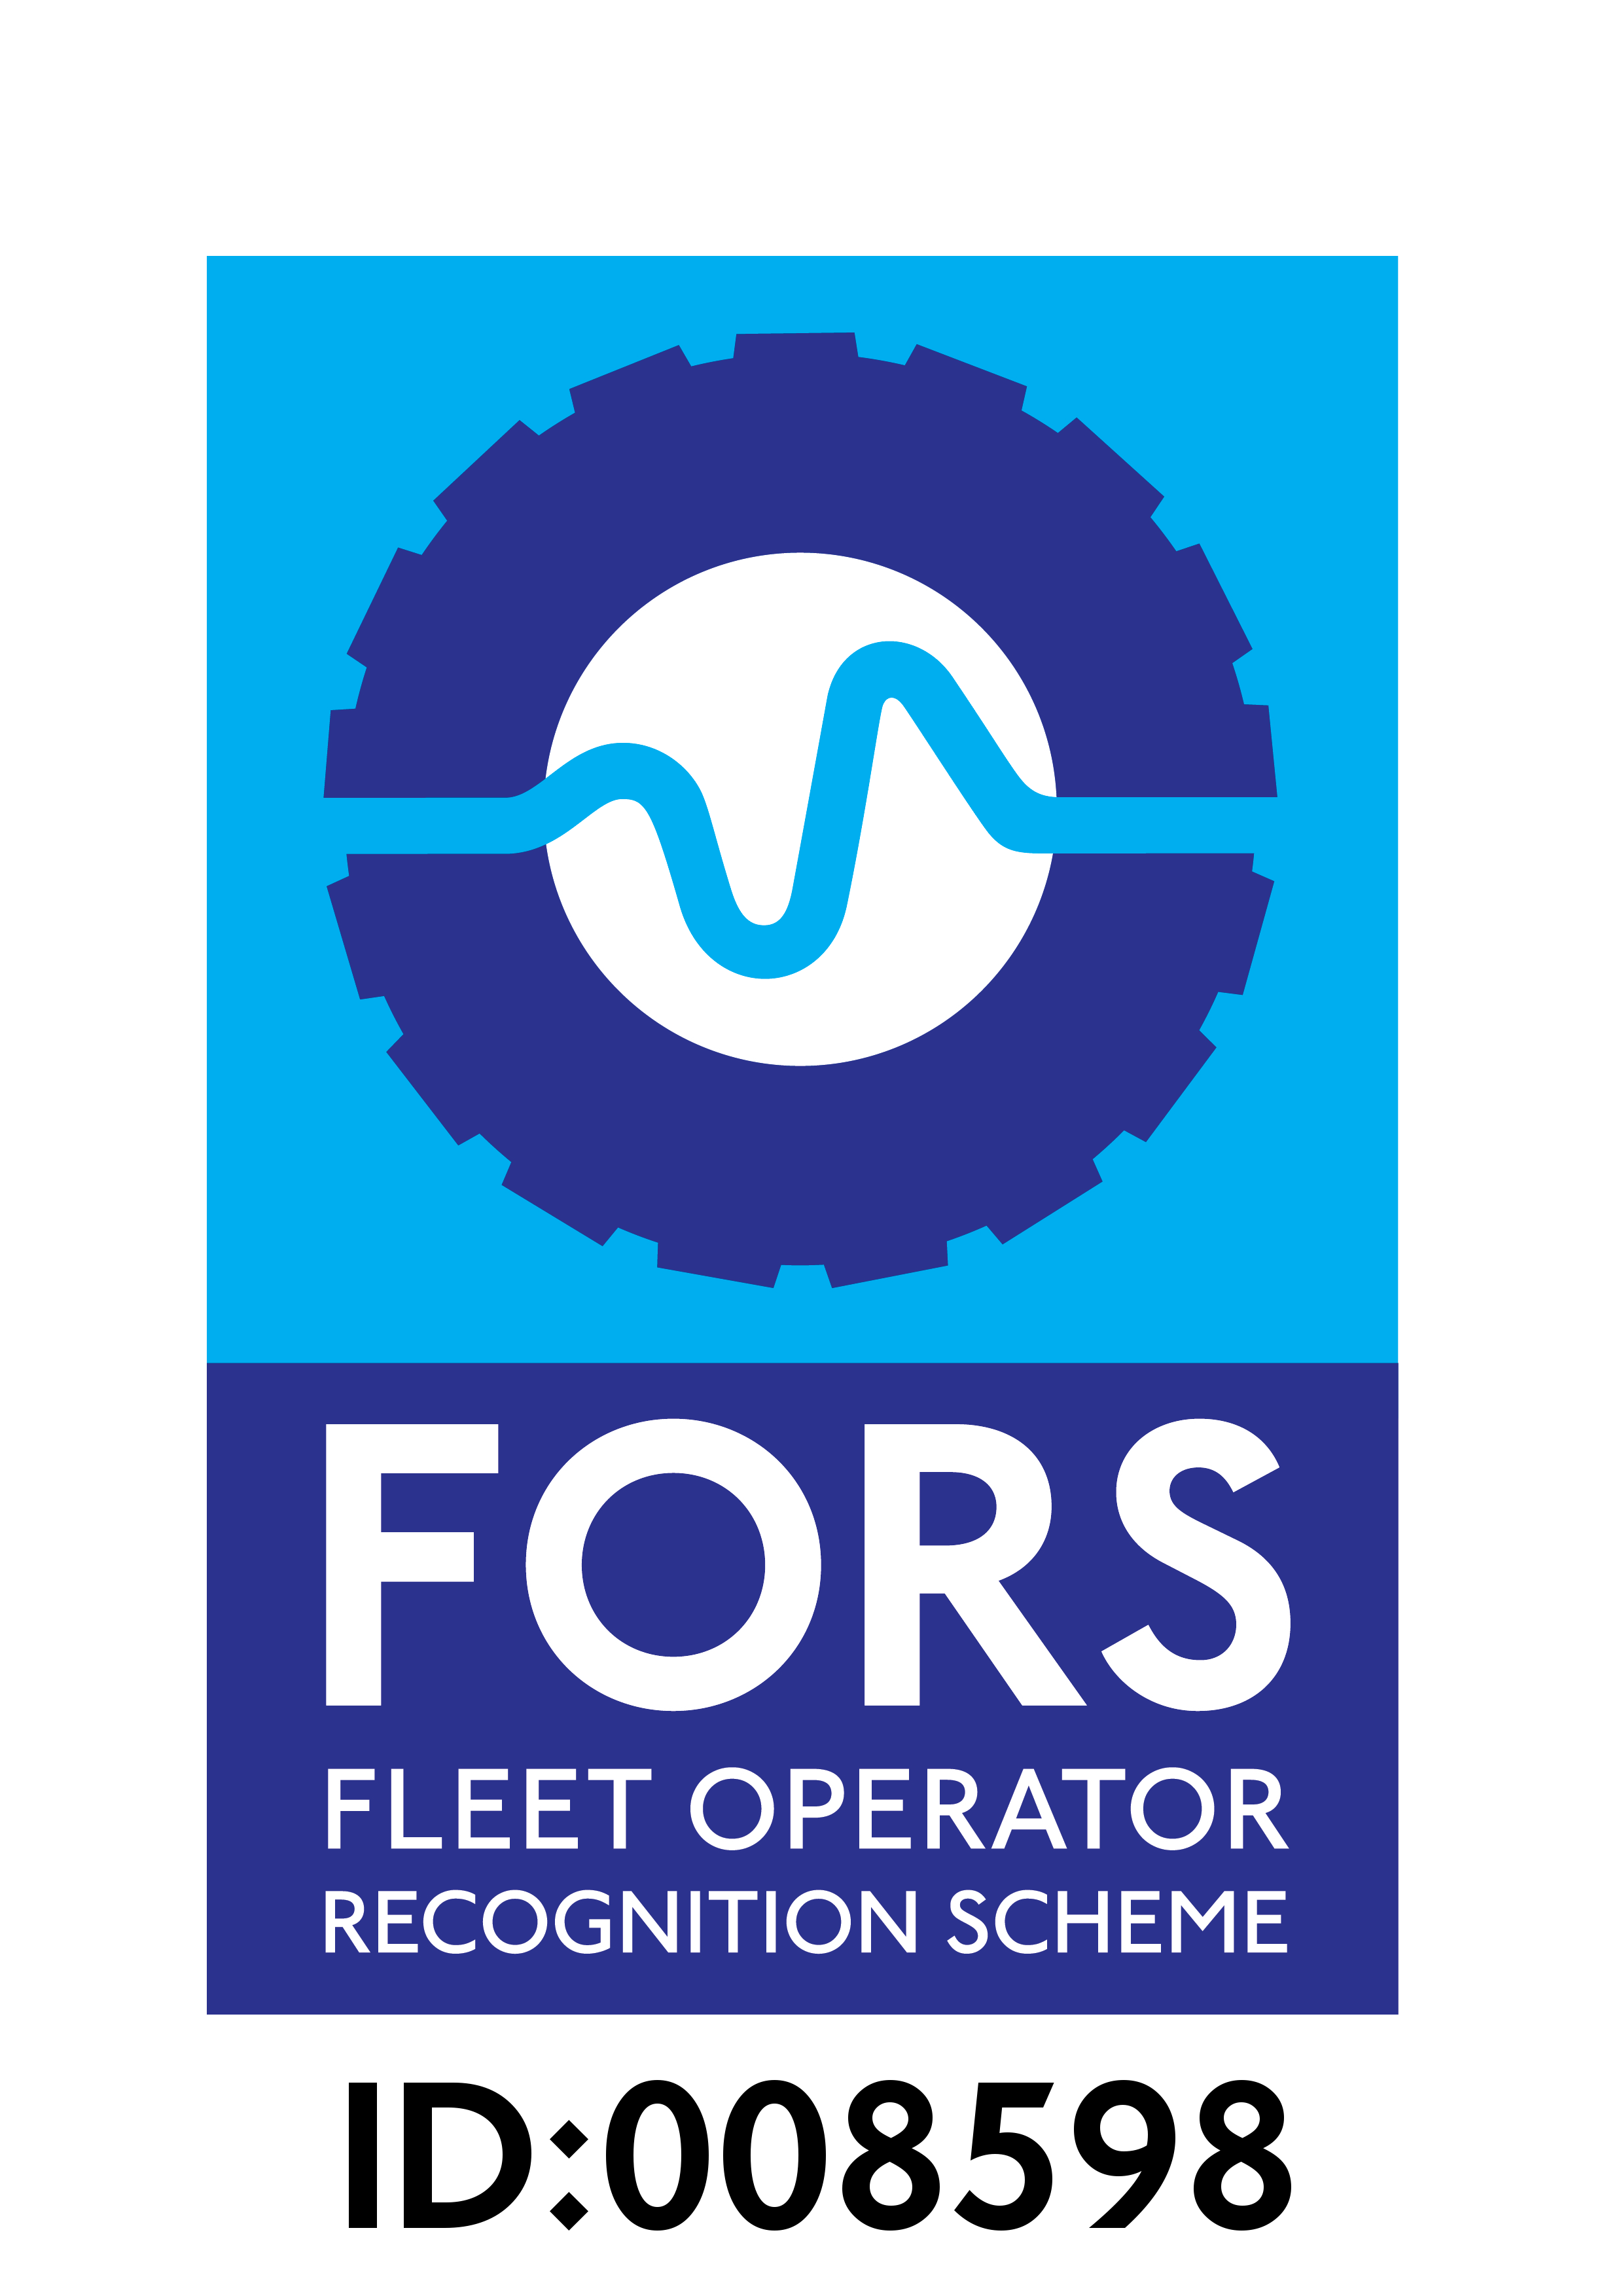 008598 FORS bronze logo - generic